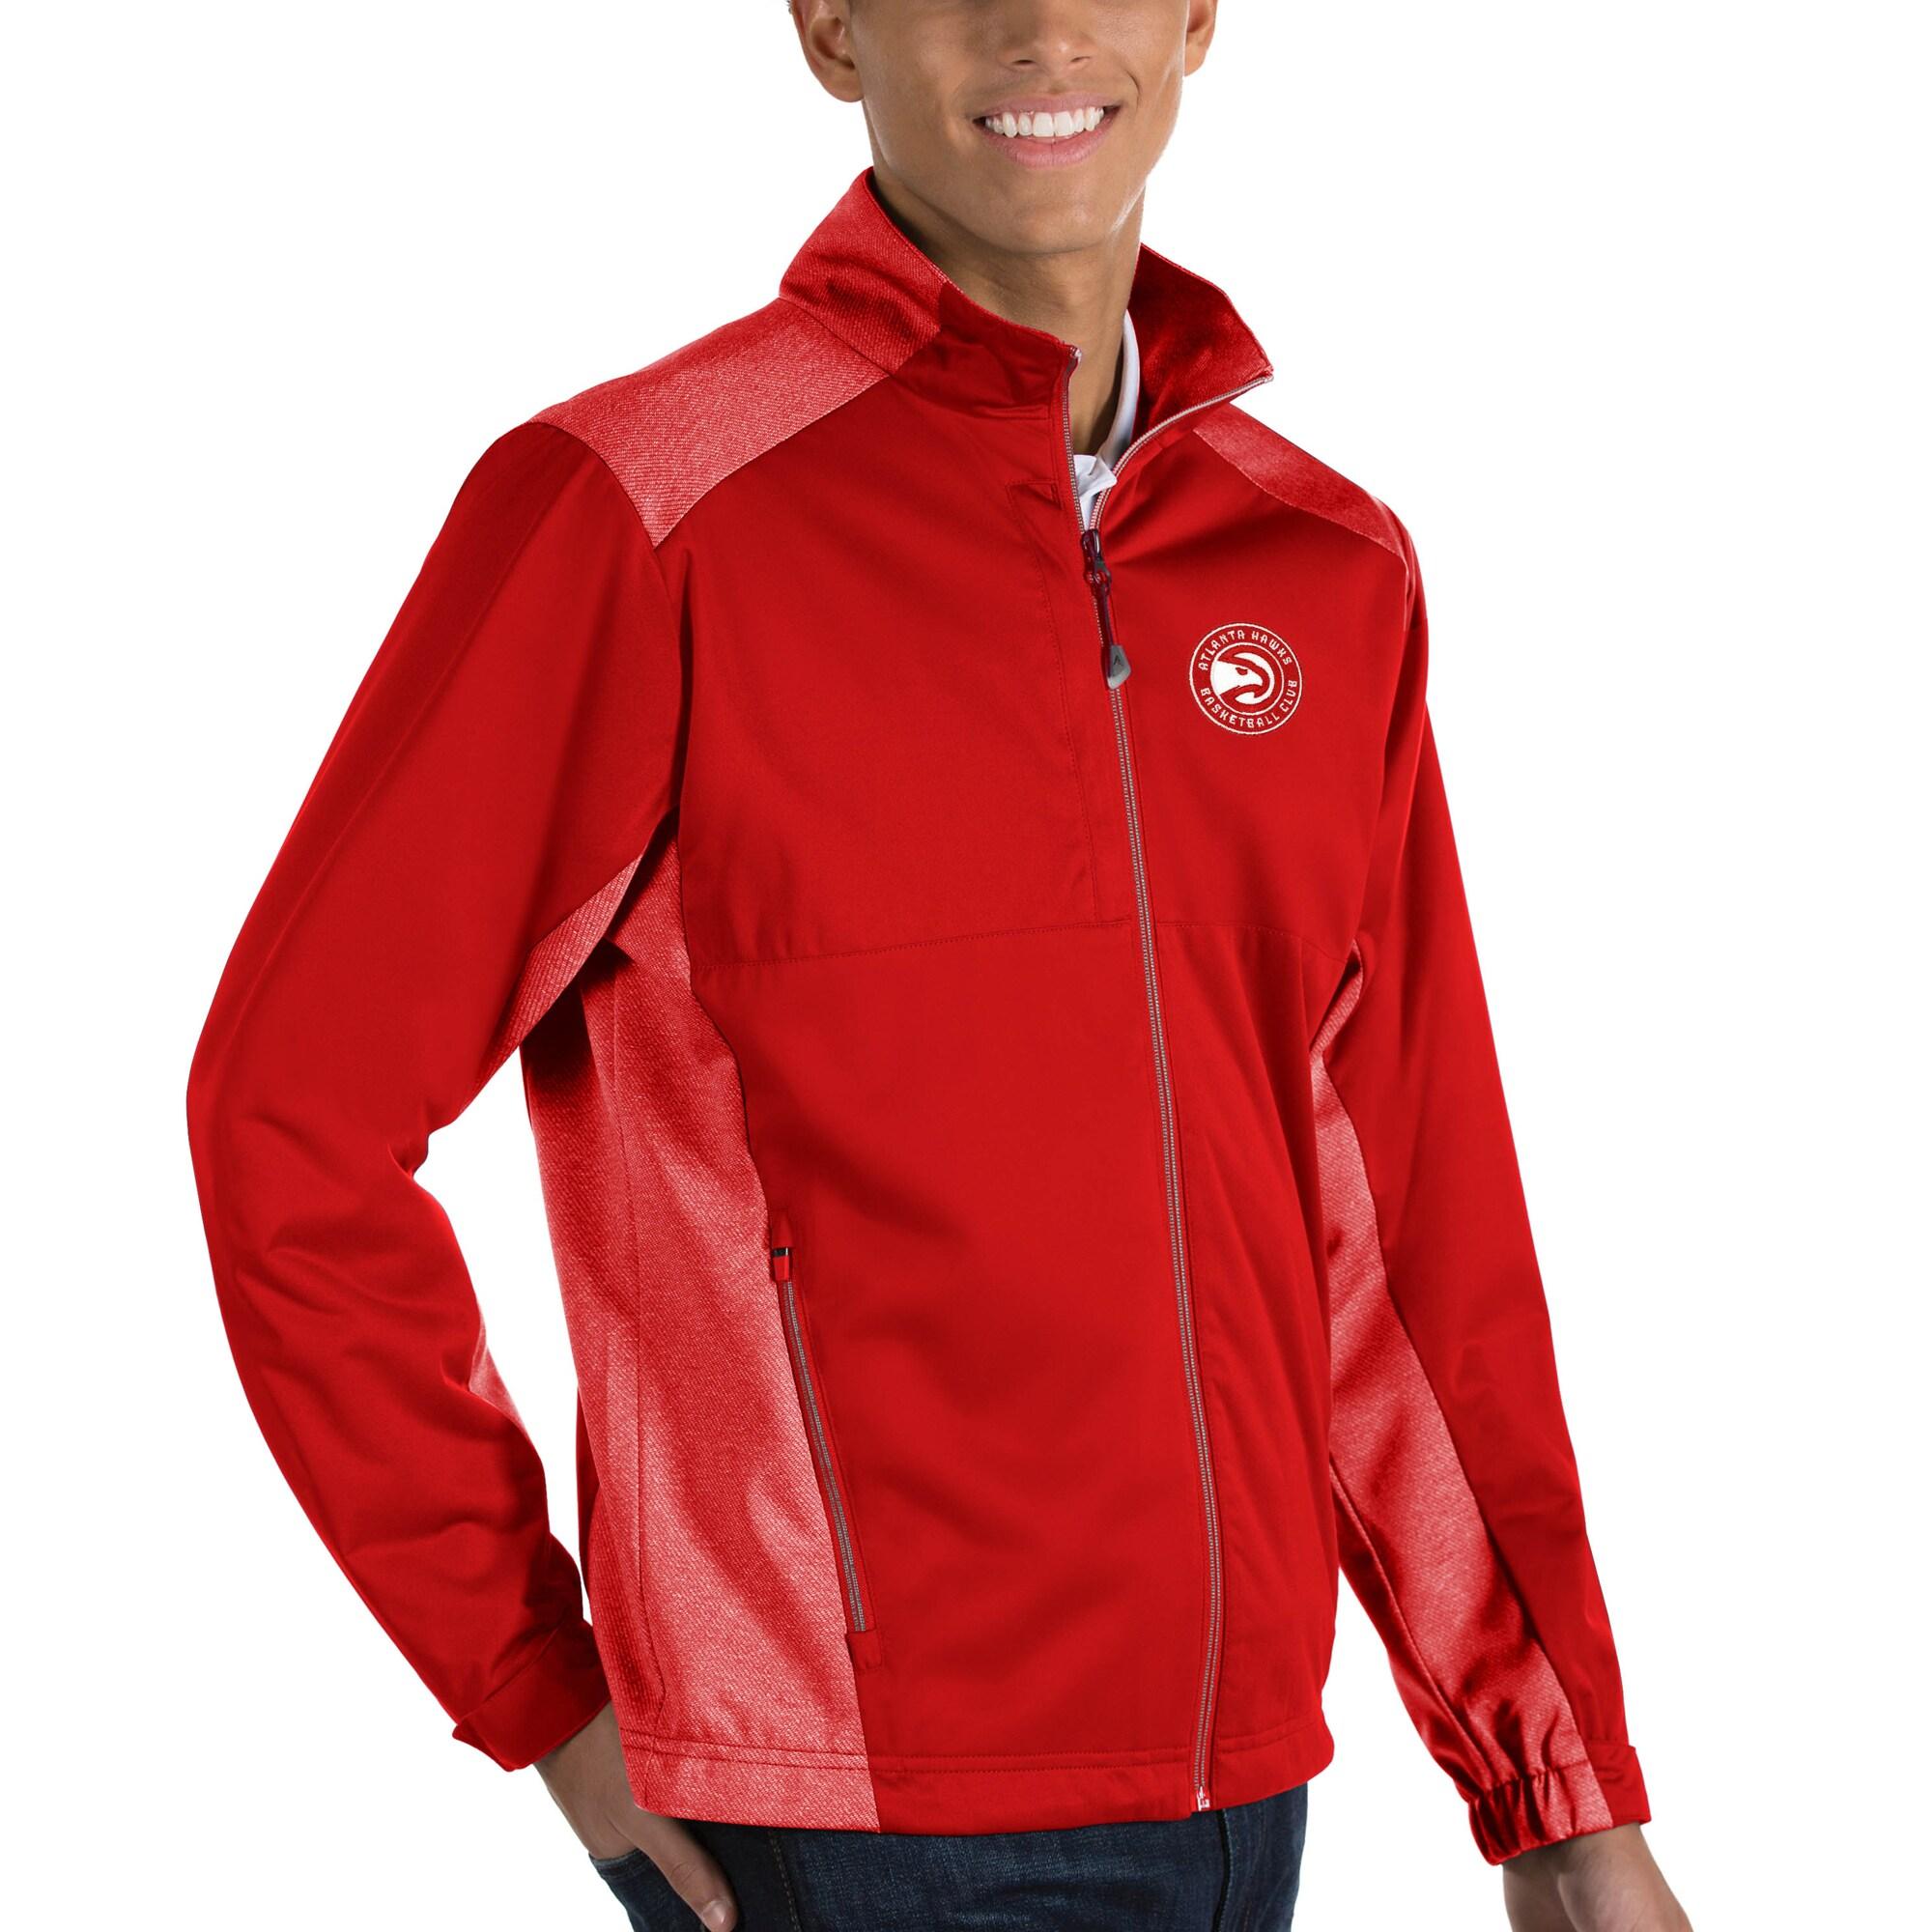 Atlanta Hawks Antigua Revolve Full-Zip Jacket - Red